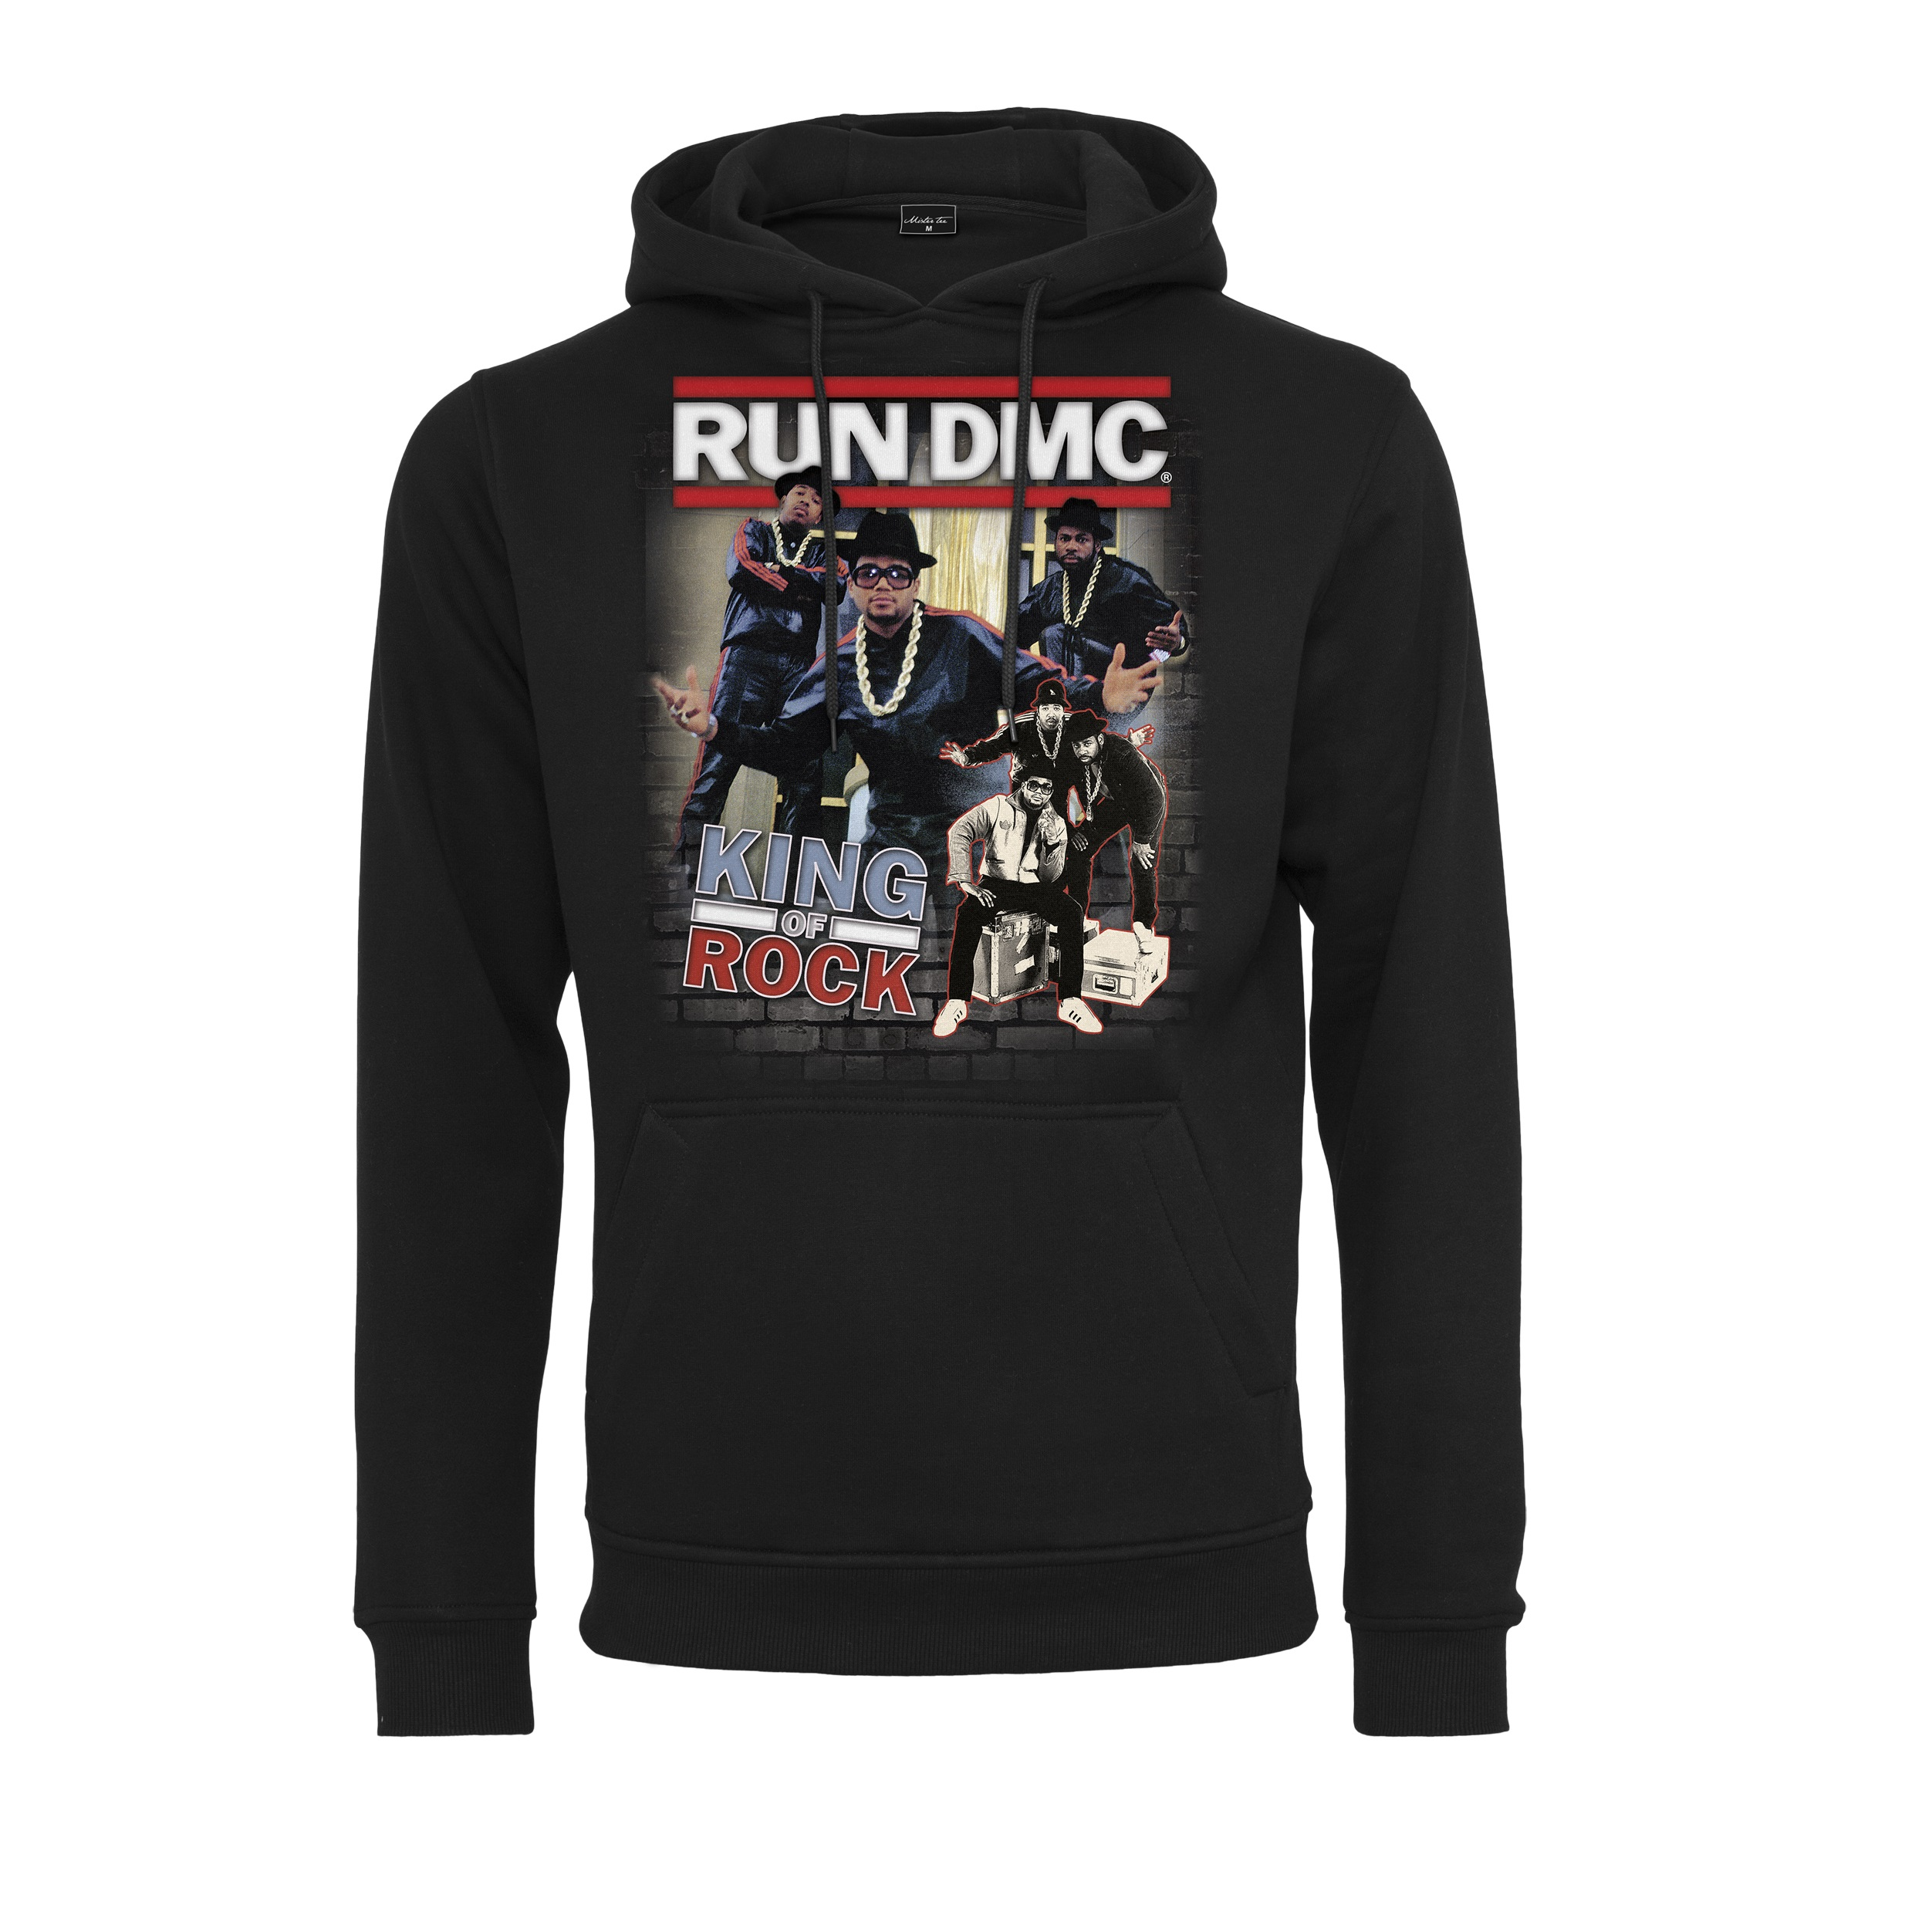 Run-DMC - Mikina King of Rock Hoody - Muž, Čierna, S